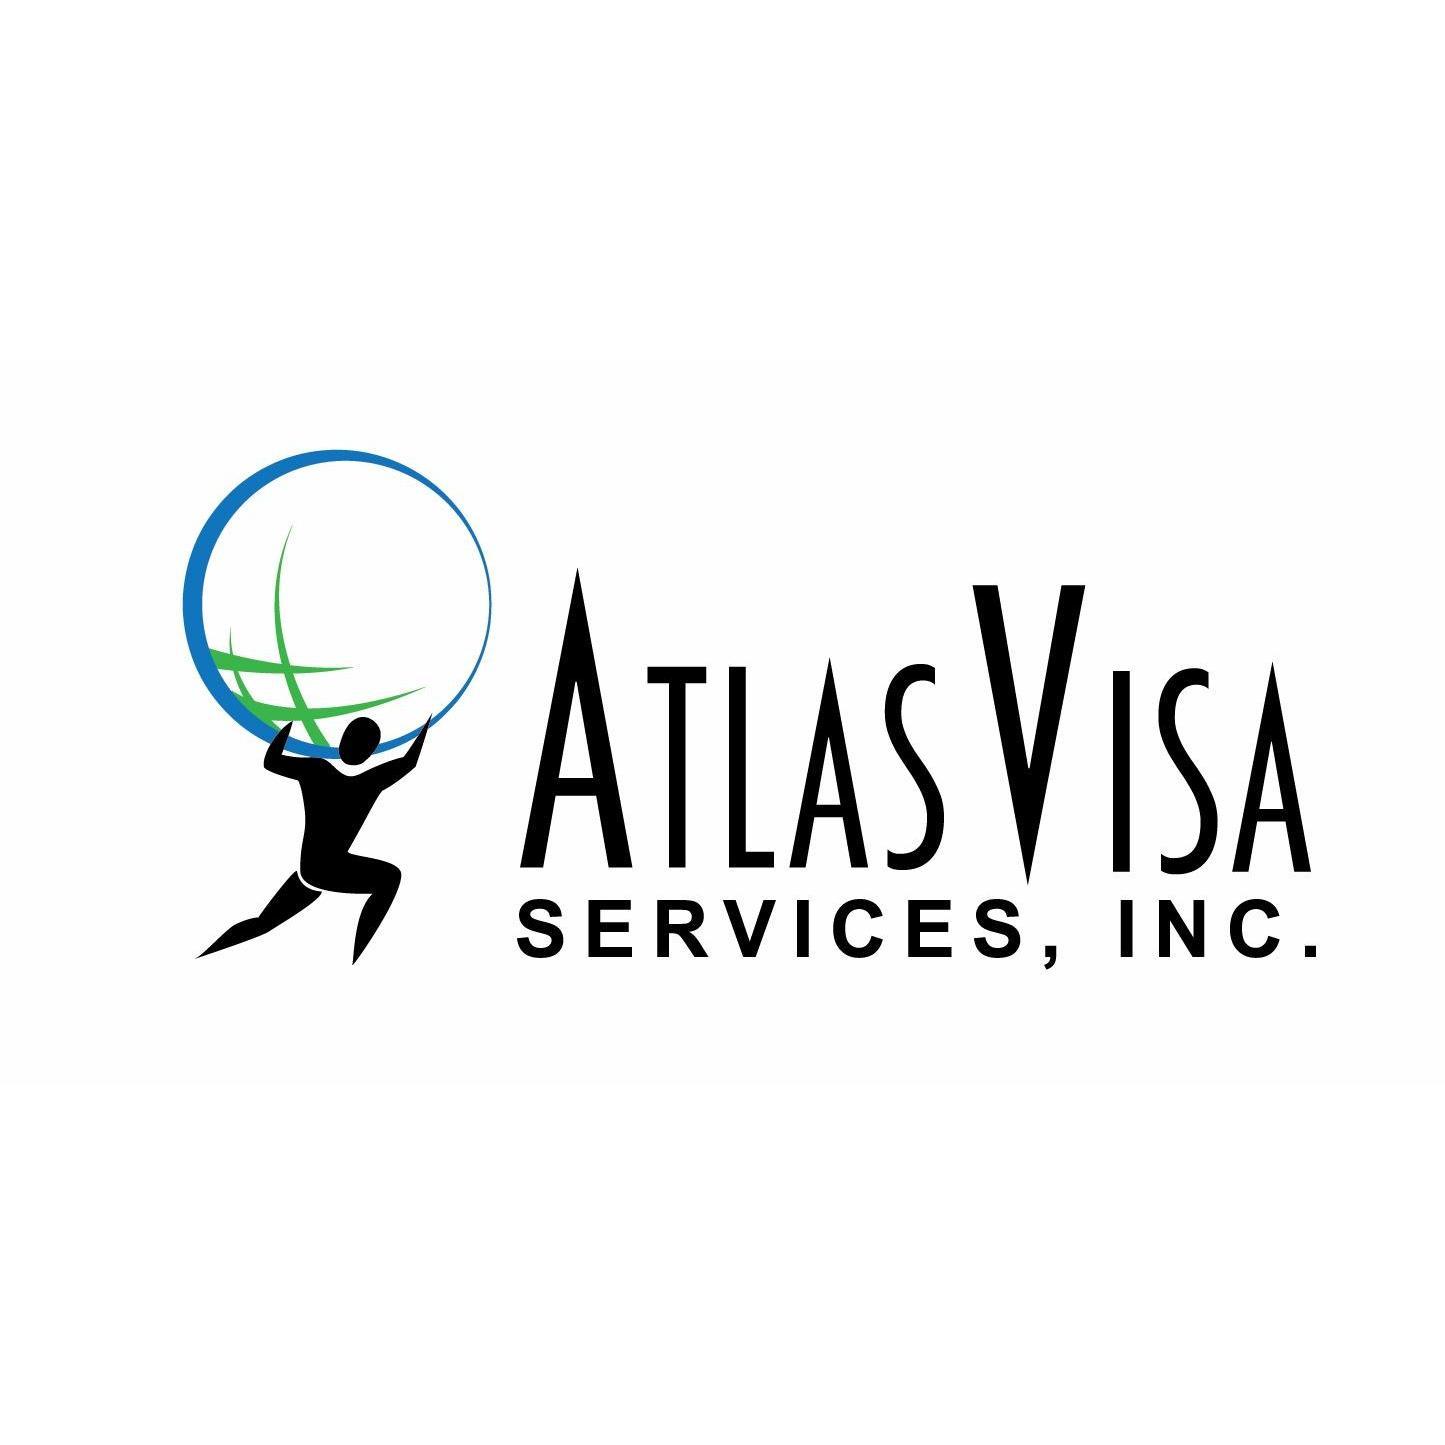 Atlas Visa Services, Inc.